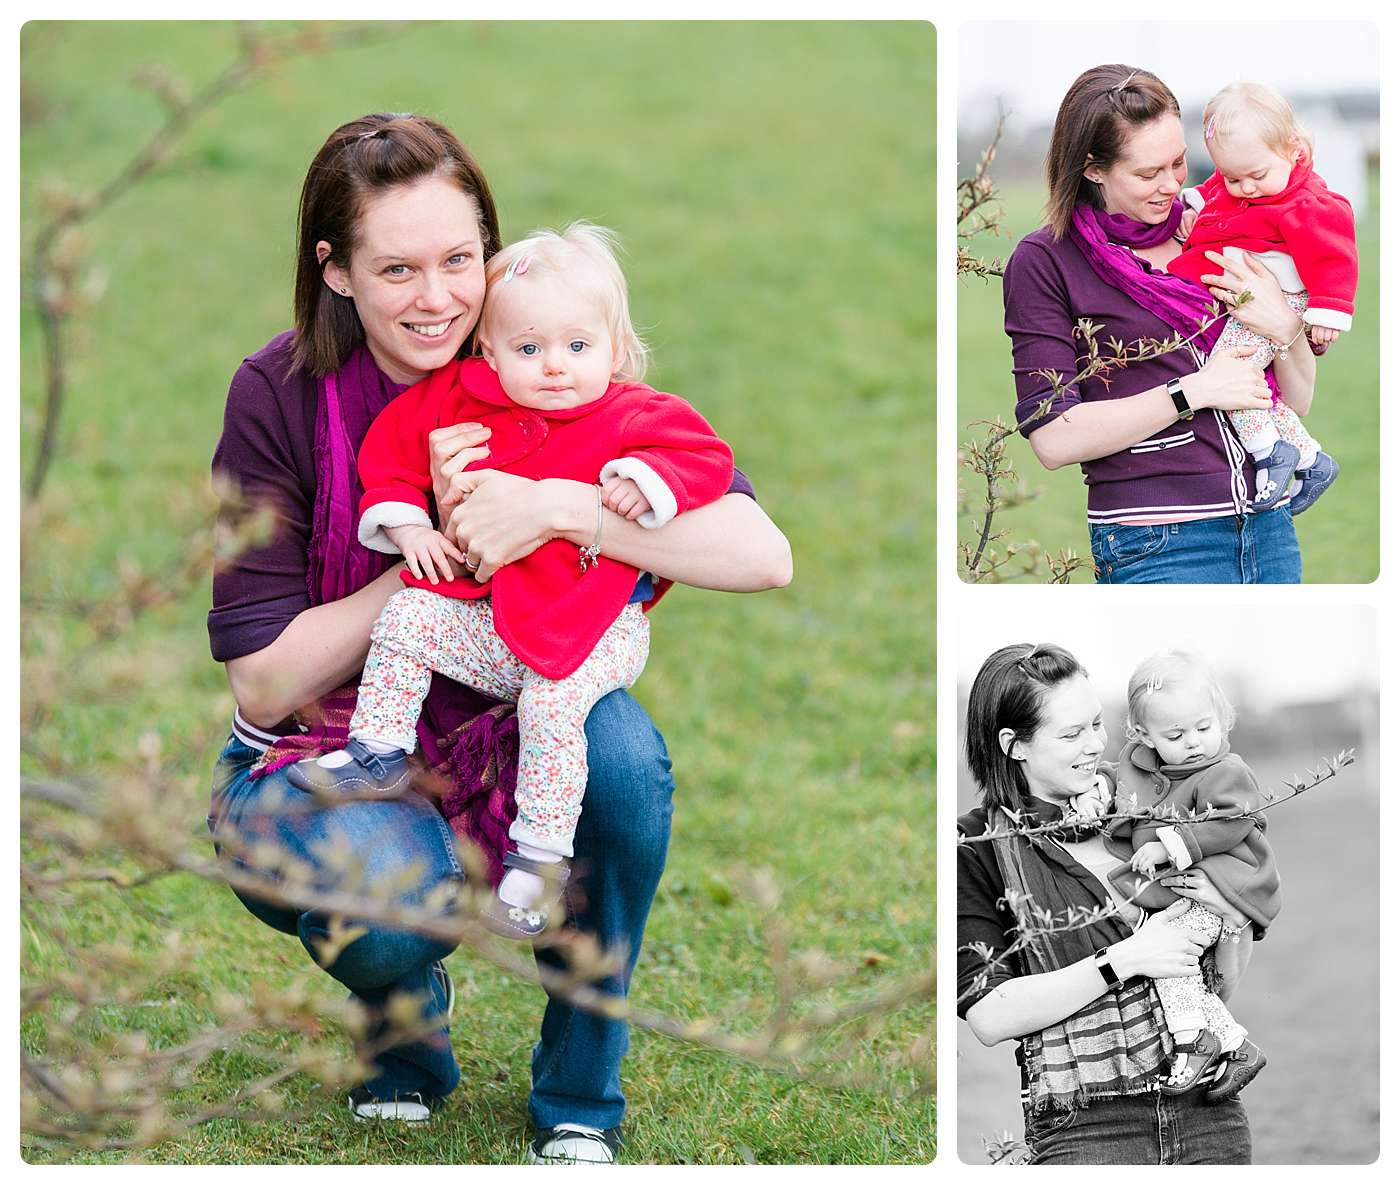 family portrait photographer edinburgh, Scotland